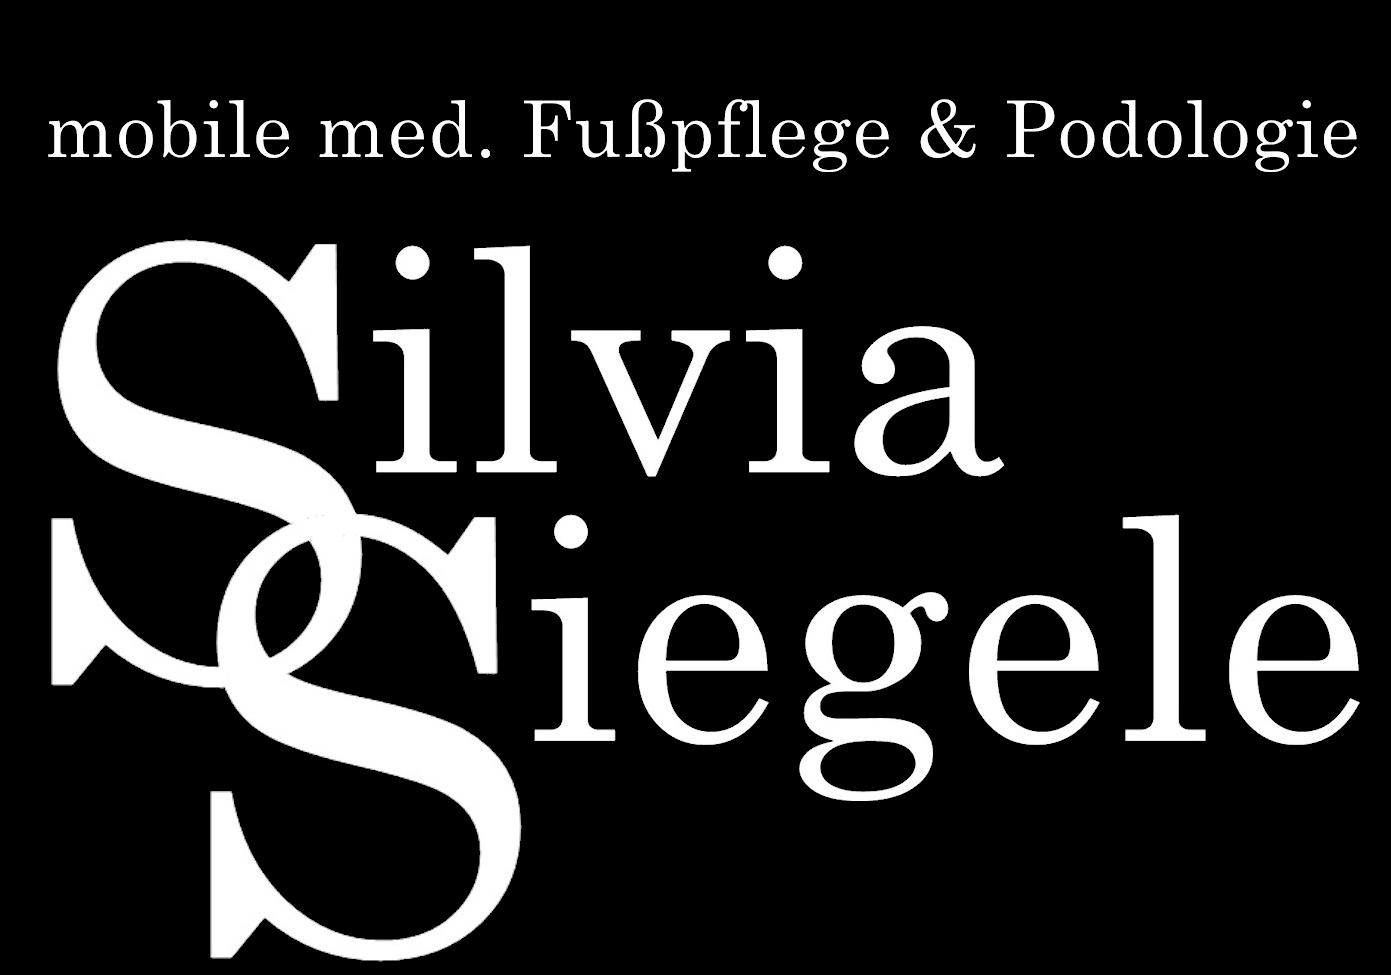 Medizinisch Fupflege SilviaSiegele